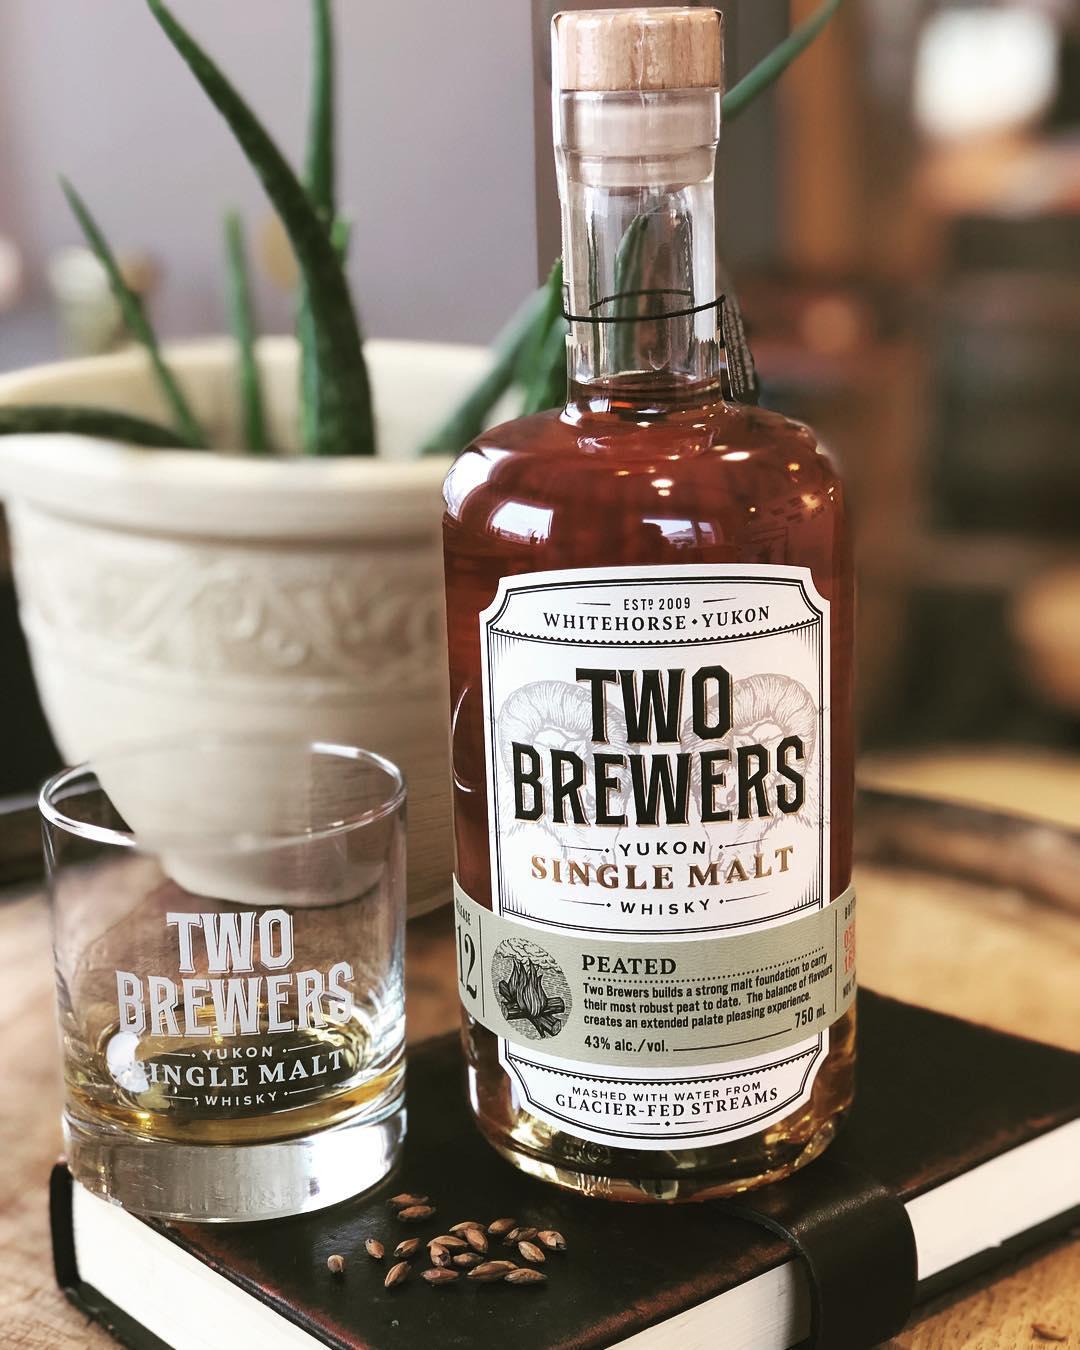 Two Brewers Yukon Single Malt Whisky